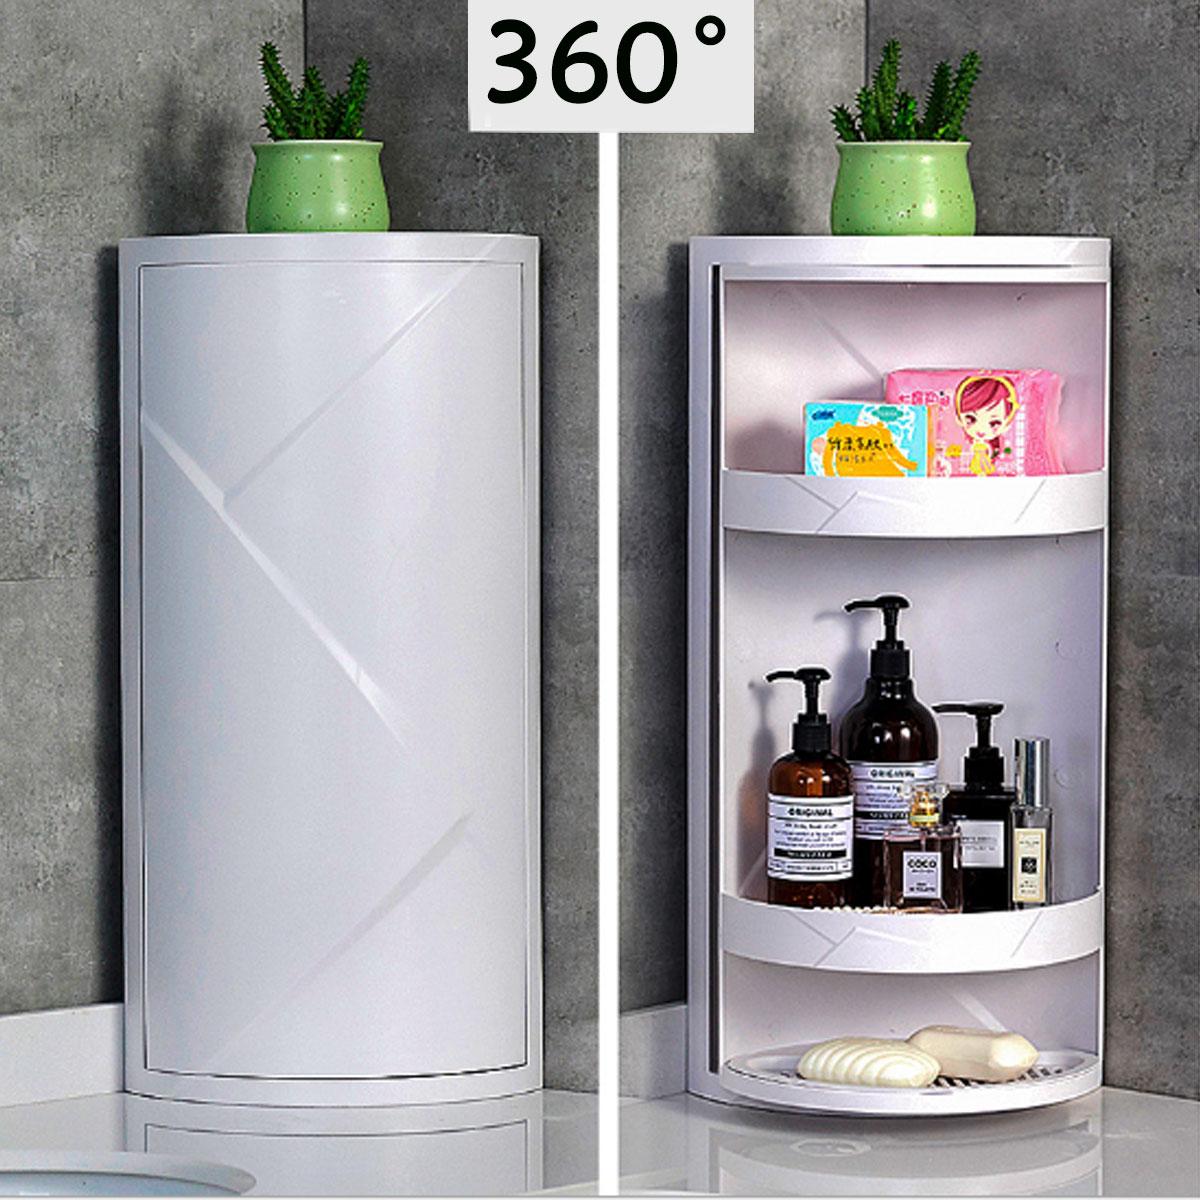 M/L Sizes Multi-function 360-degree Rotatable Bathroom Storage Rack Corner Storage Rack Cabinet Store Cosmetics/Perfum/Shampoo